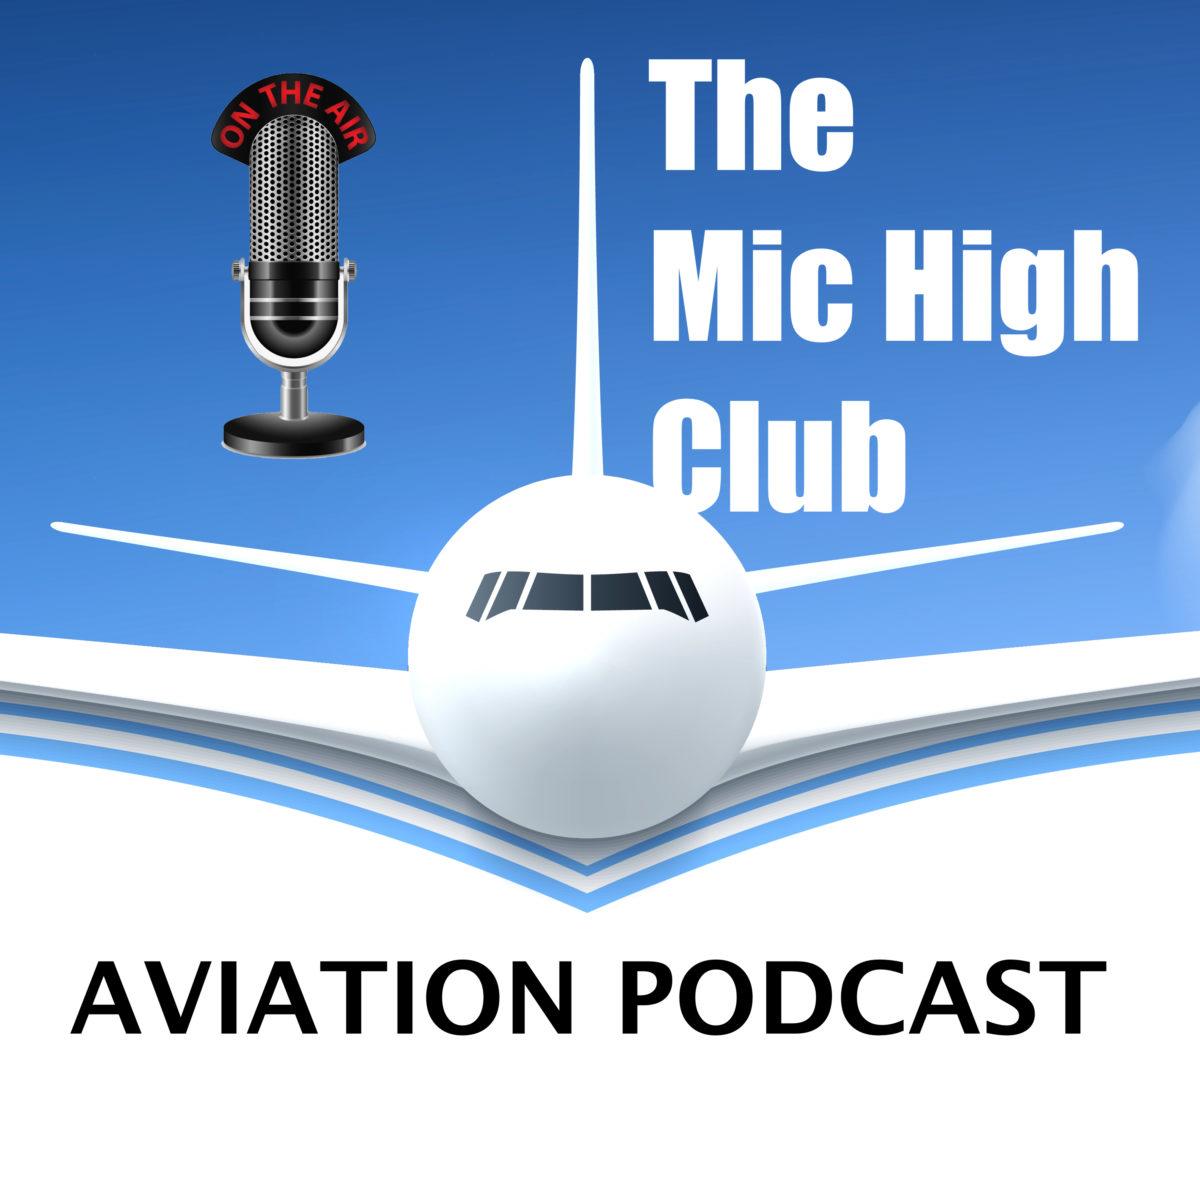 logo The Mic High club